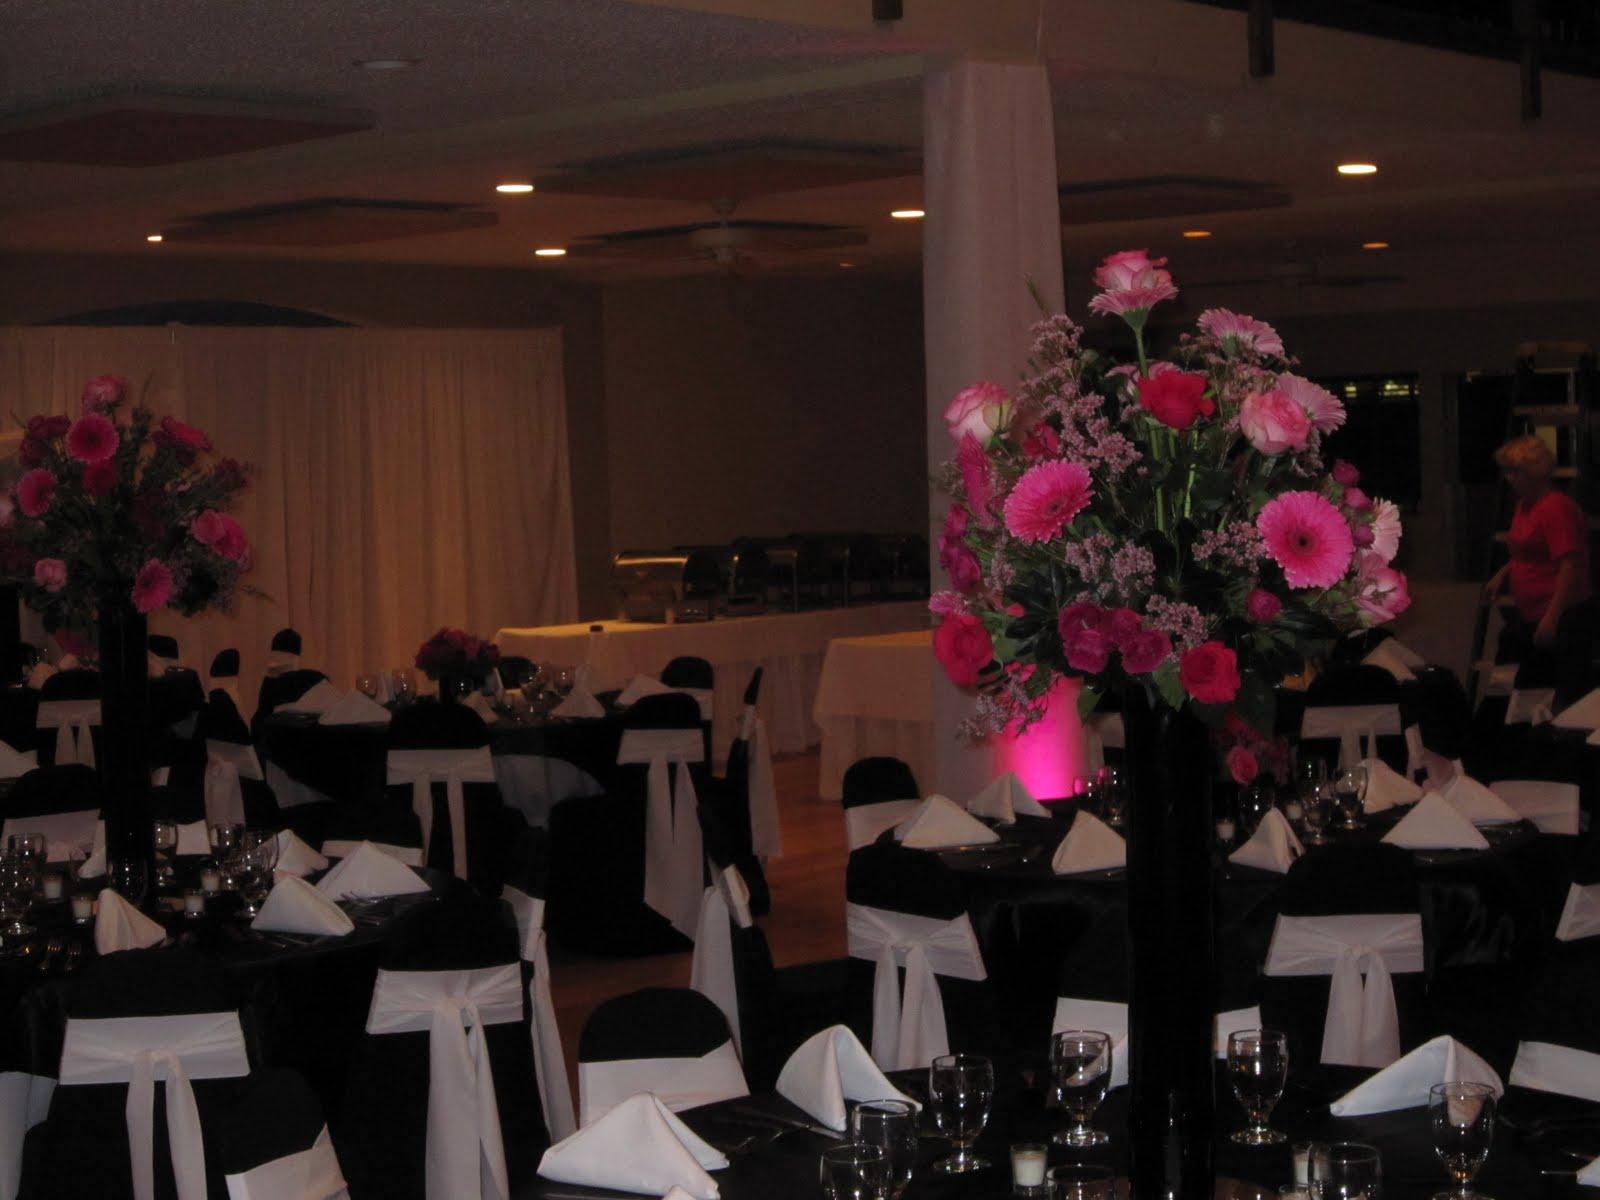 Wedding Ideas Red And Silver - Wedding Dress & Decore Ideas